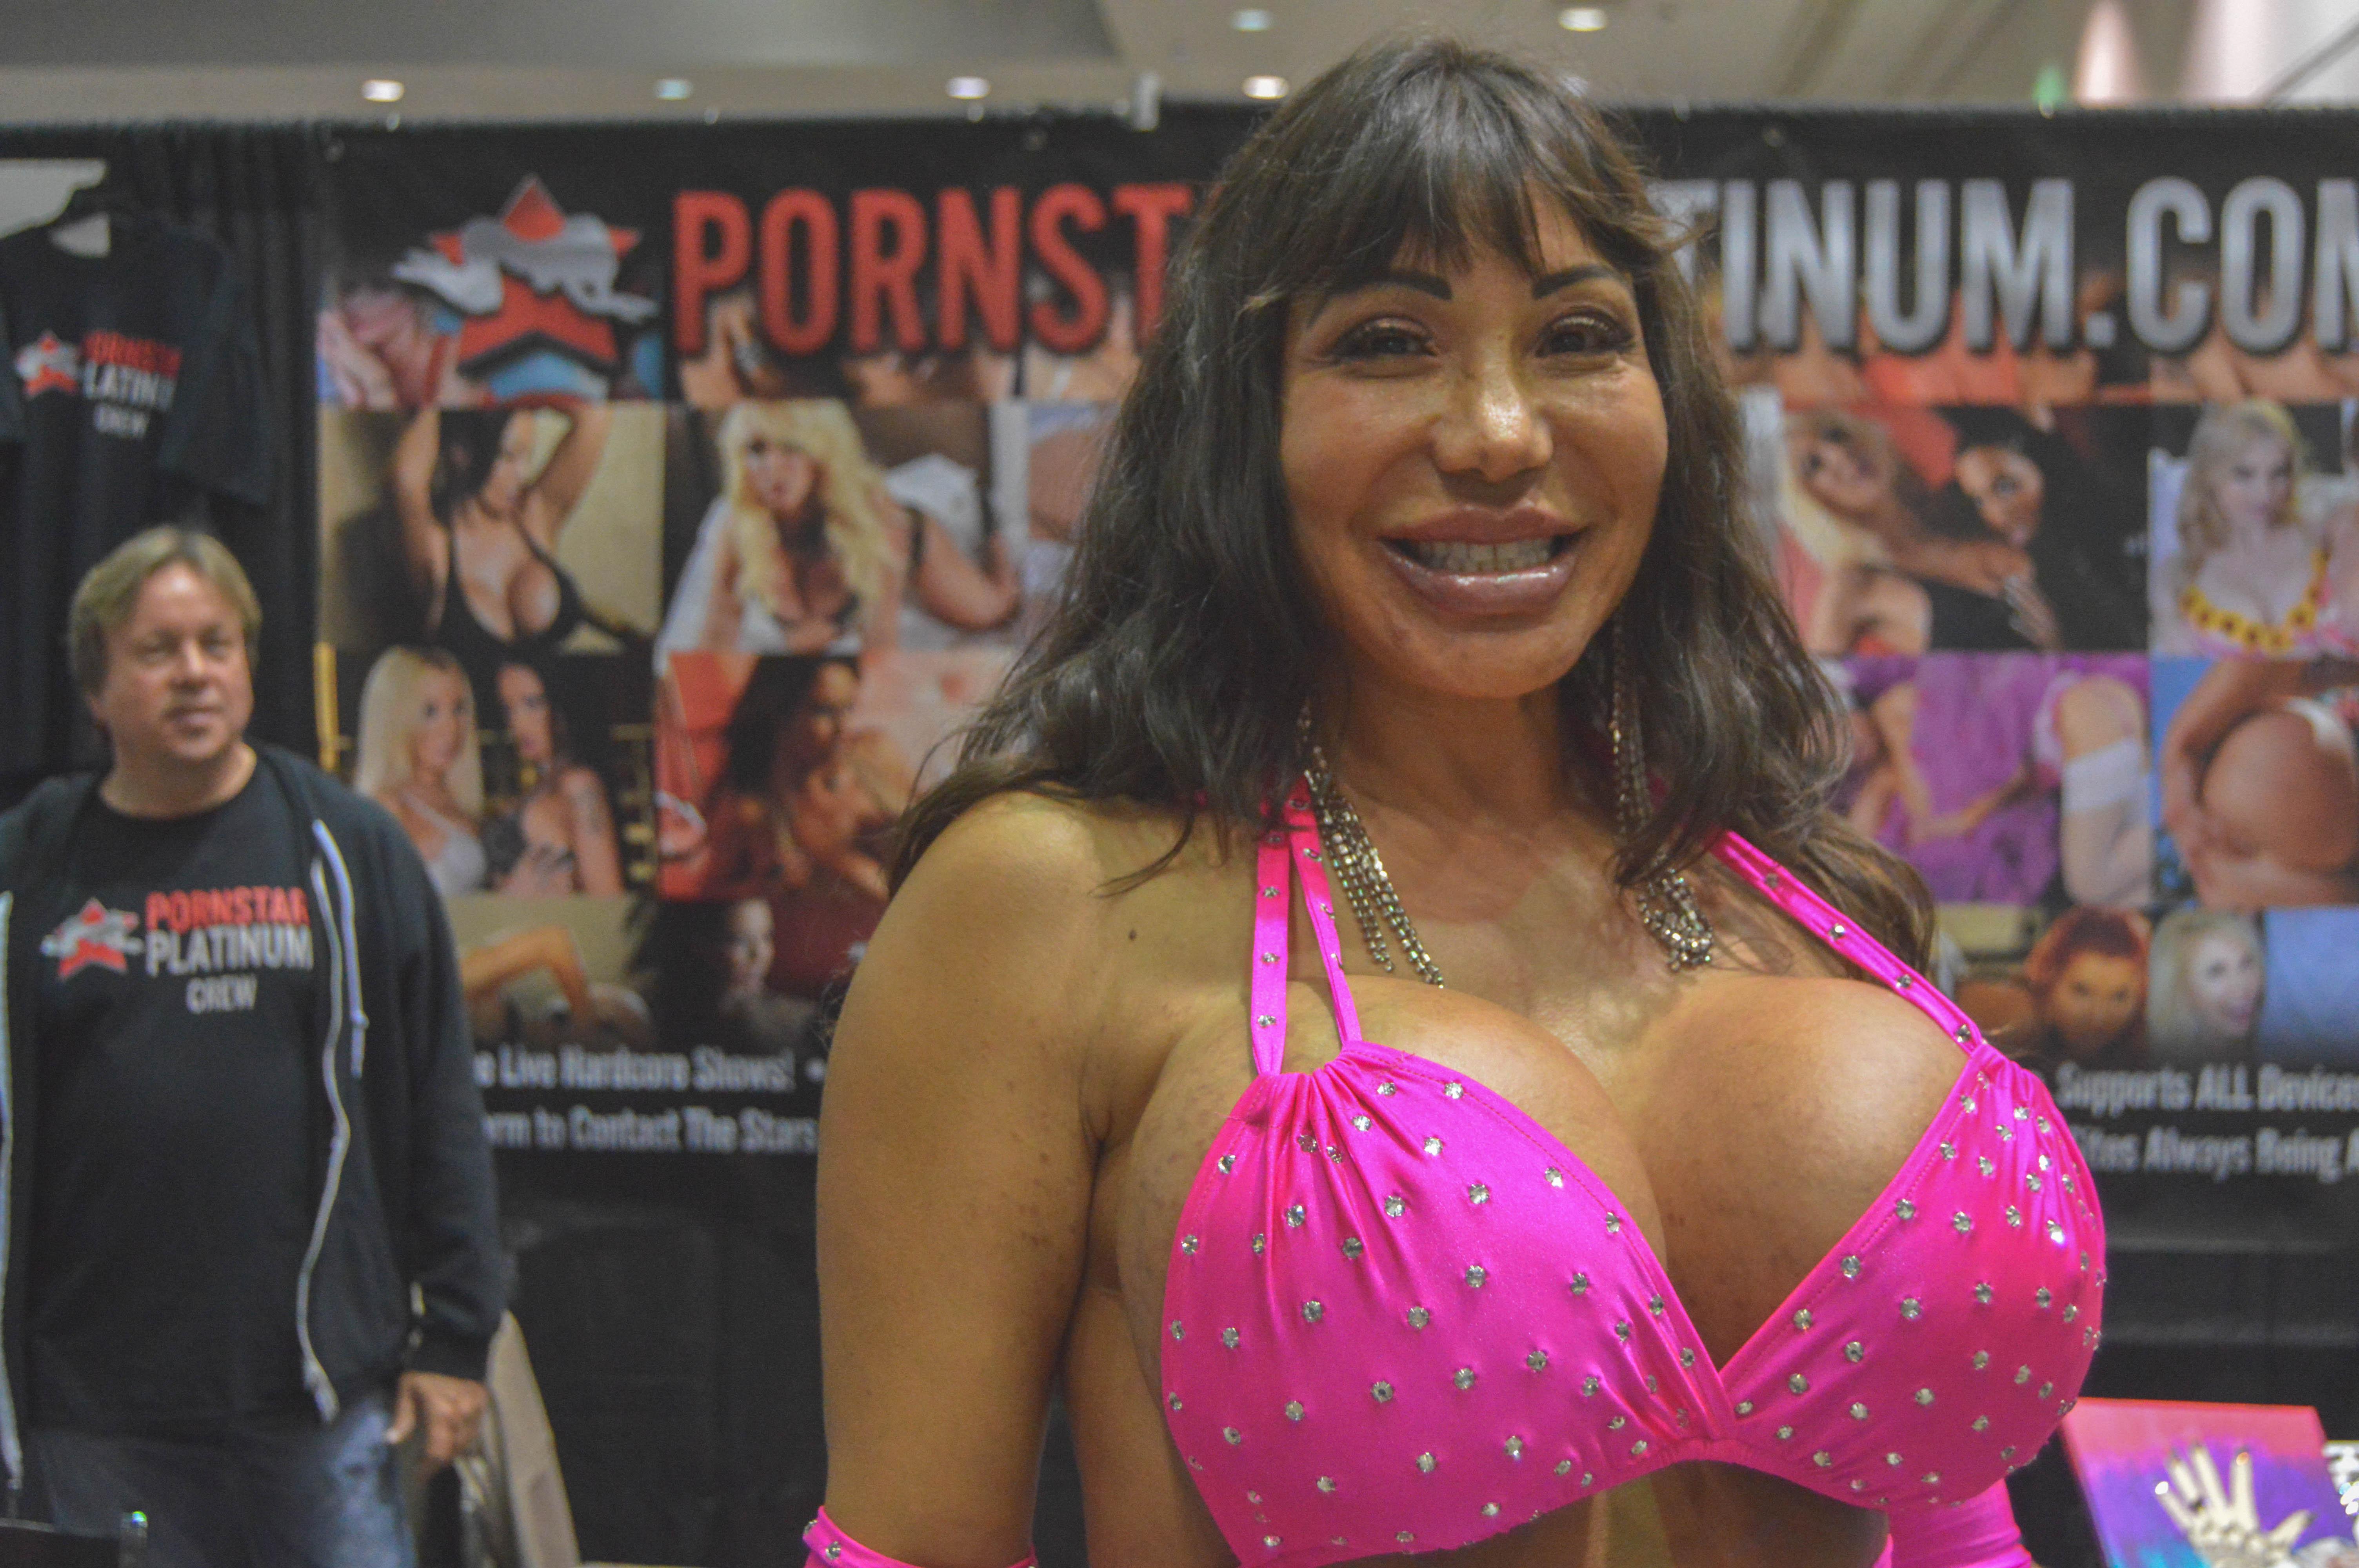 Ava Devine pornstars on sex ed